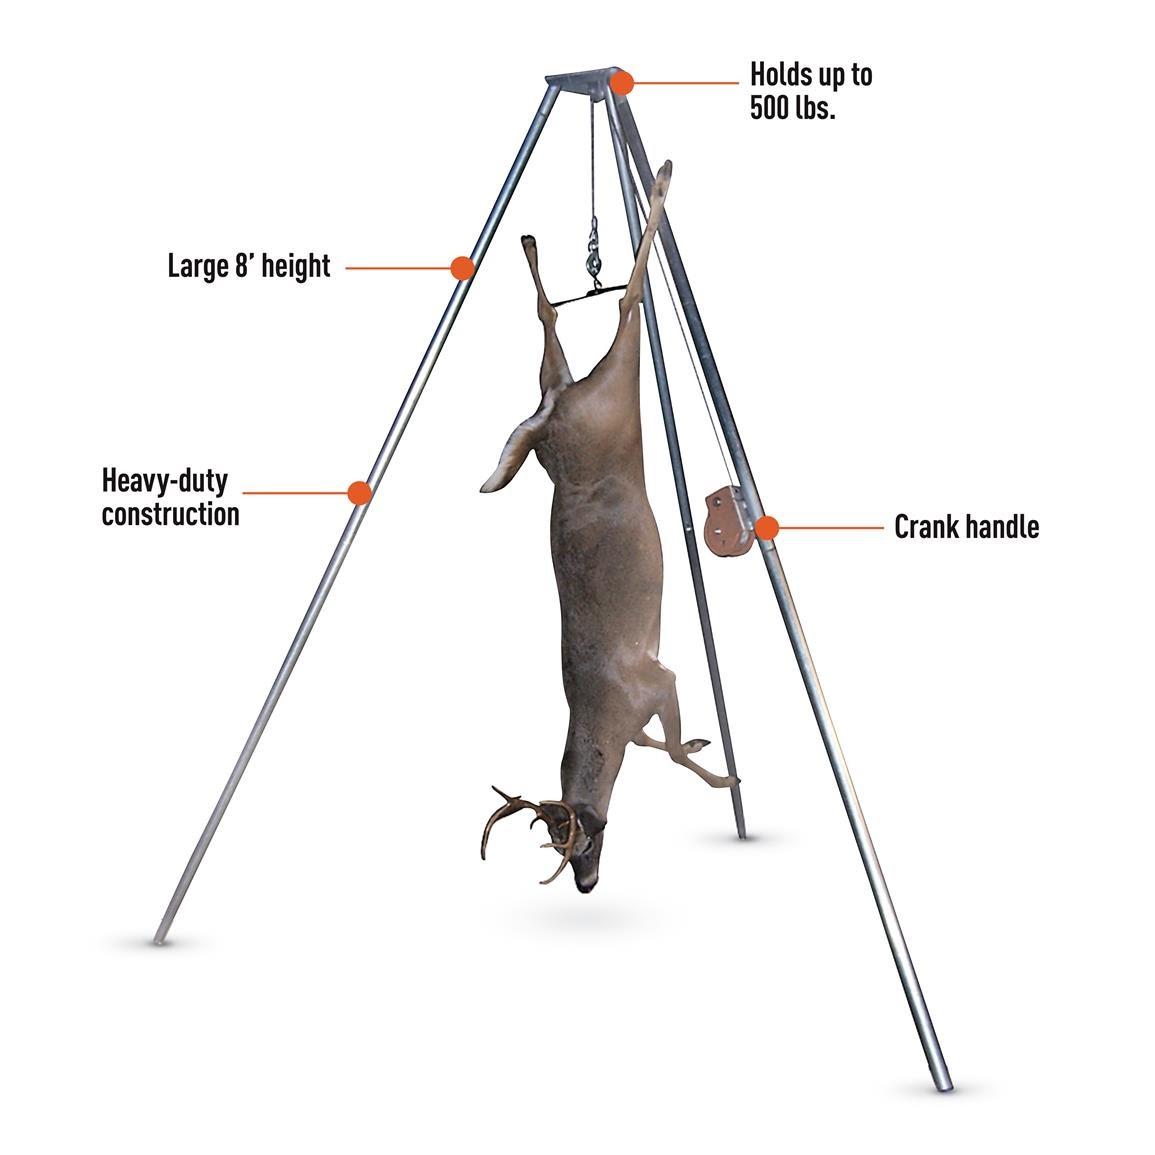 Details about  /Gambrel Game Hoist Deer Pig Bear Elk Hanger Allen Takedown Collapsible 500 lbs